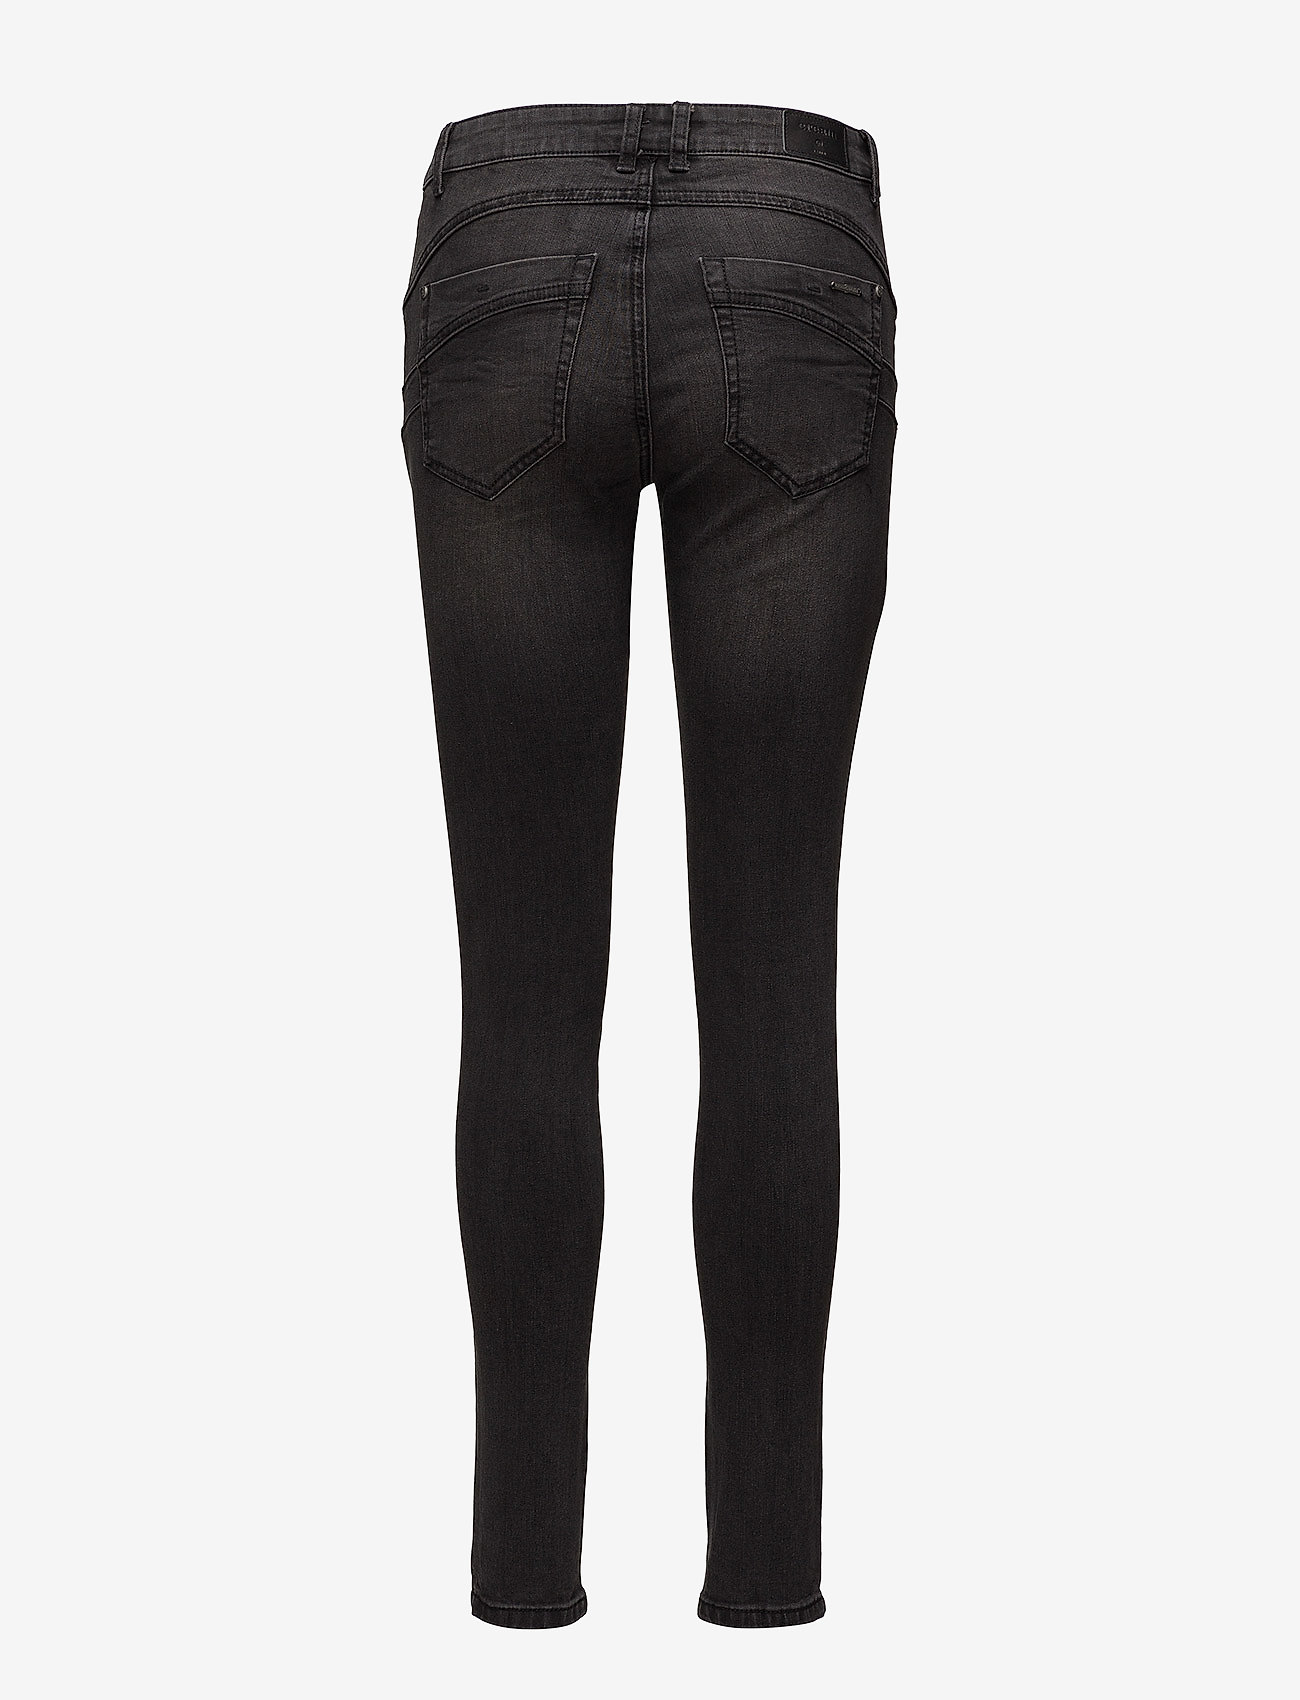 Cream - Sally Jeans - Shape fit - skinny jeans - dark grey denim